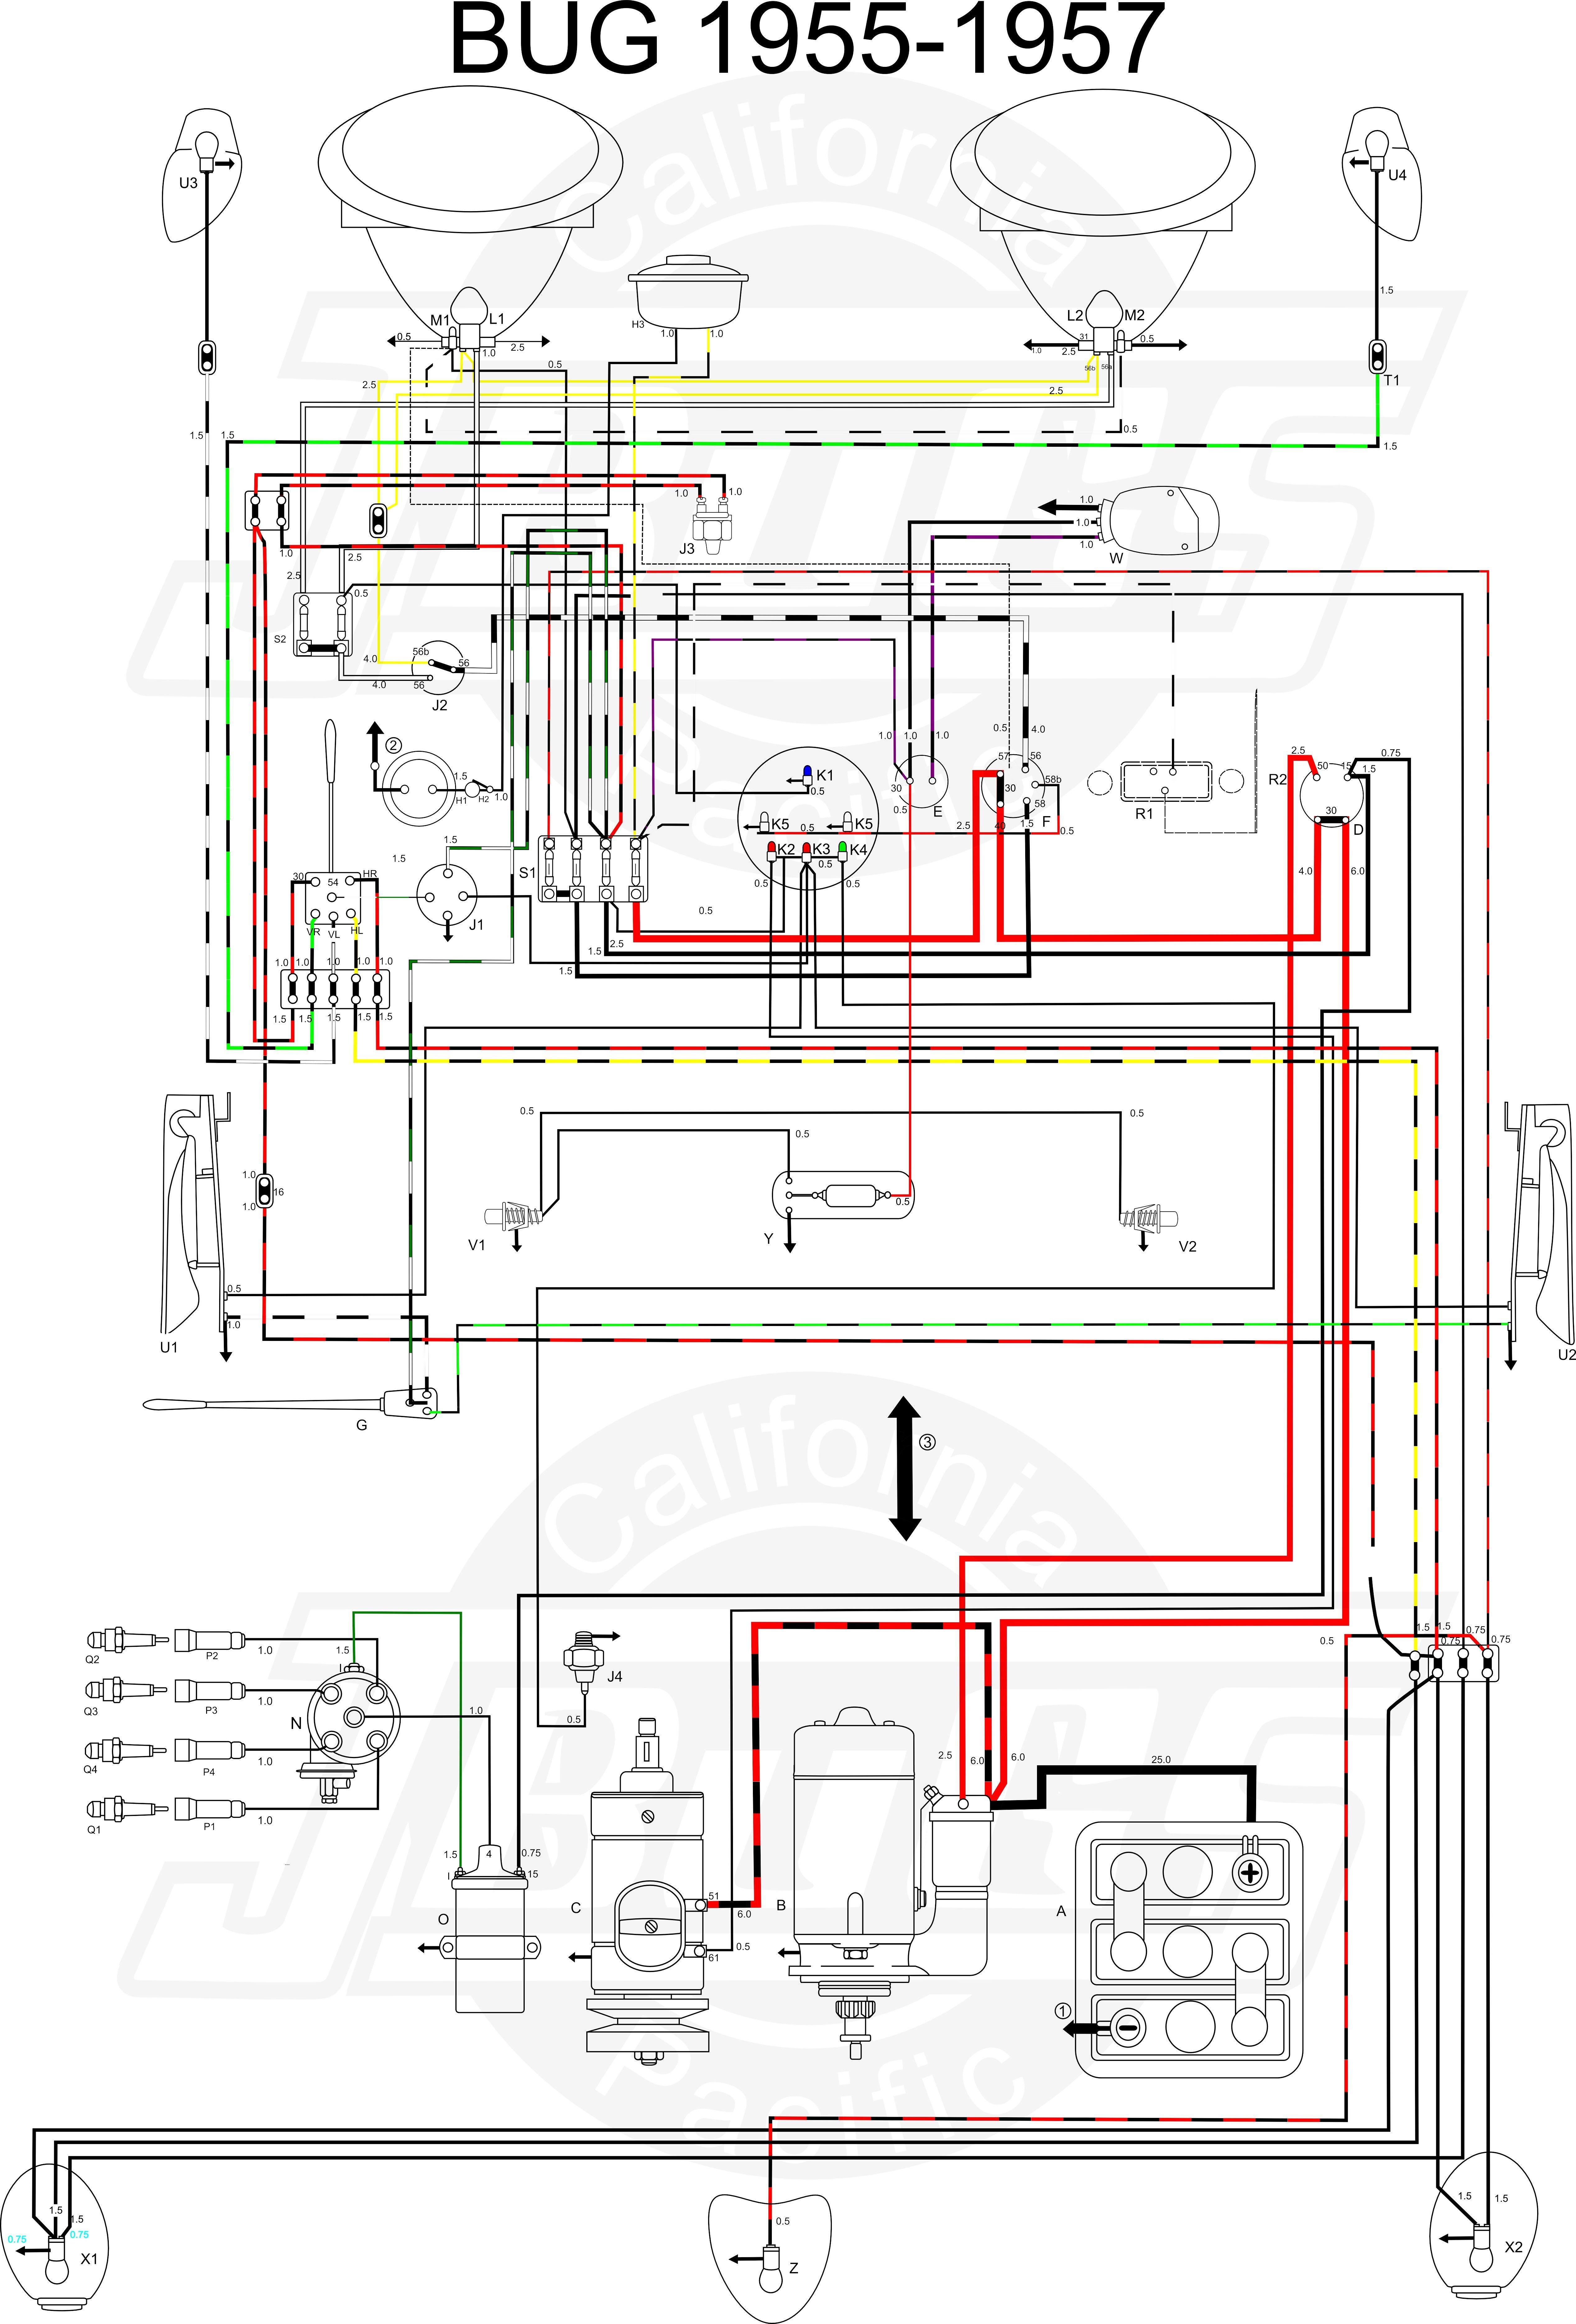 Elegant Vw Sand Rail Wiring Diagram In 2020 Sand Rail Dune Buggy Vw Dune Buggy